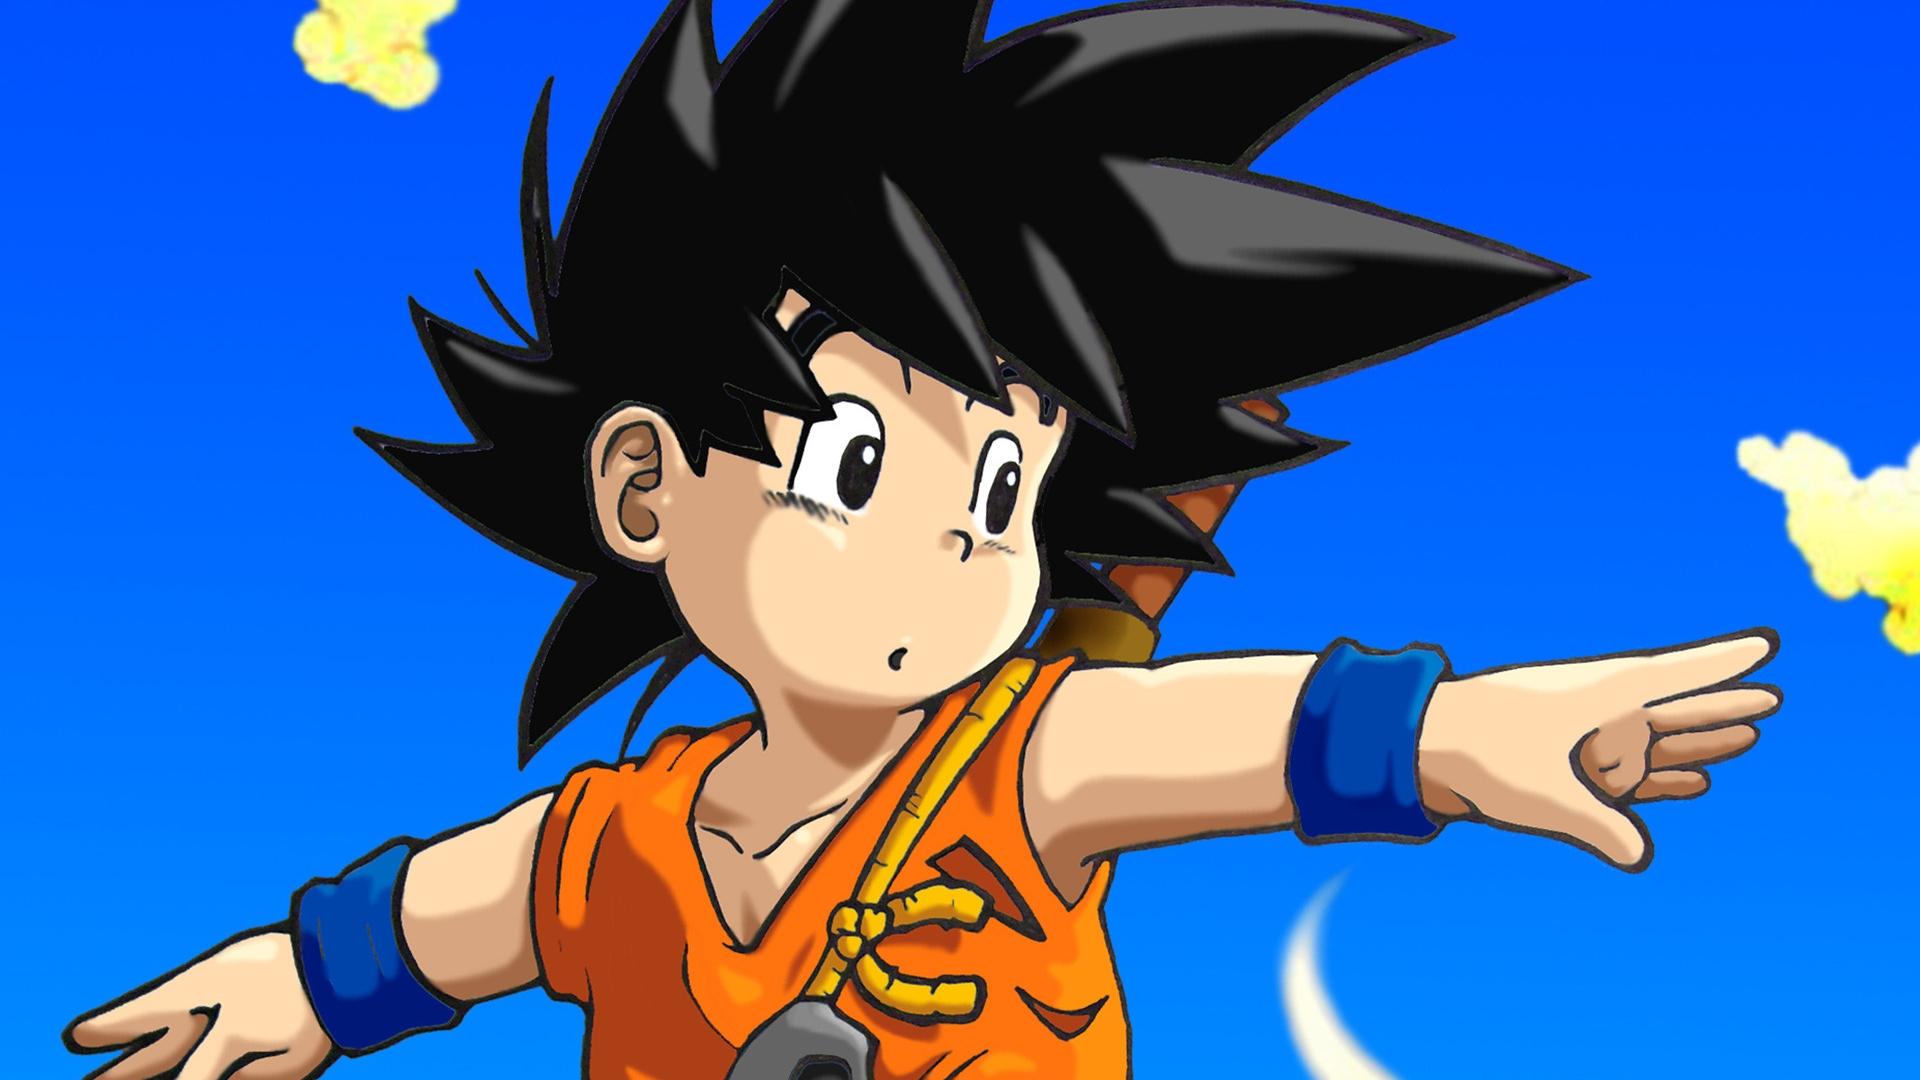 Free Download Son Goku 4k Ultra Hd Wallpaper For Desktop Hd Wallpapers 1920x1200 For Your Desktop Mobile Tablet Explore 75 Goku Wallpapers Dragon Ball Z Wallpaper